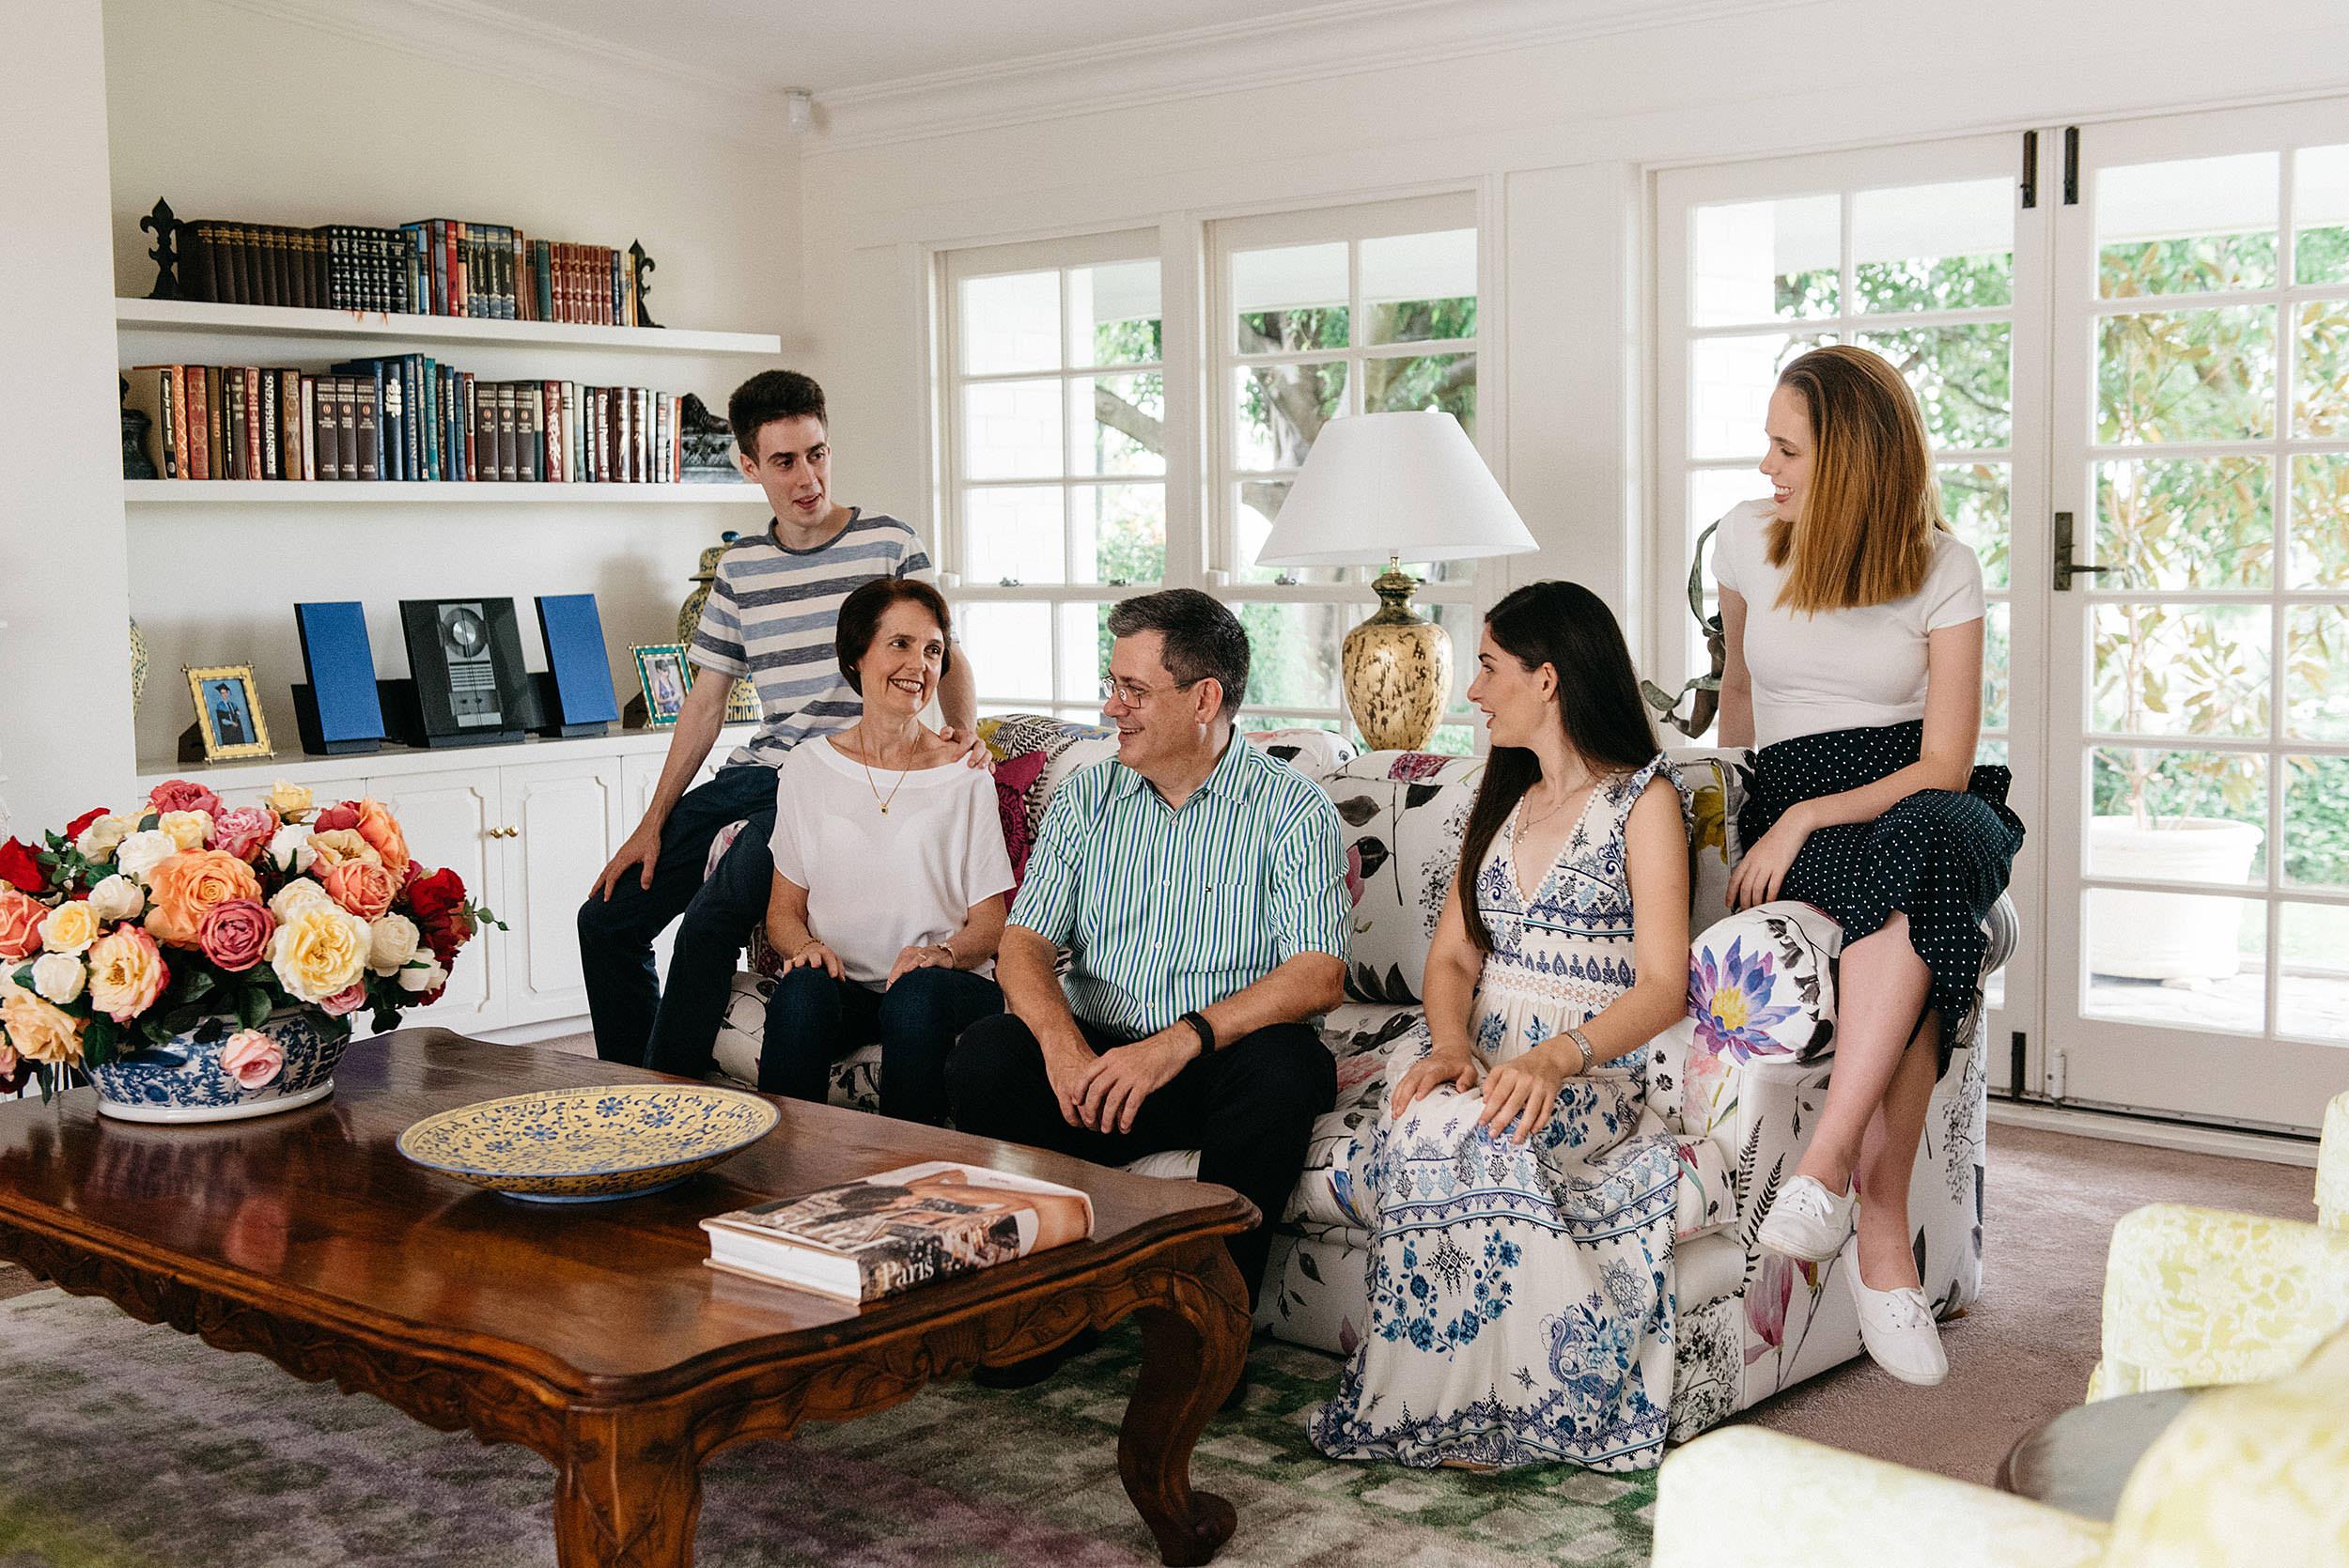 brisbane-family-portrait-photographer-03.jpg